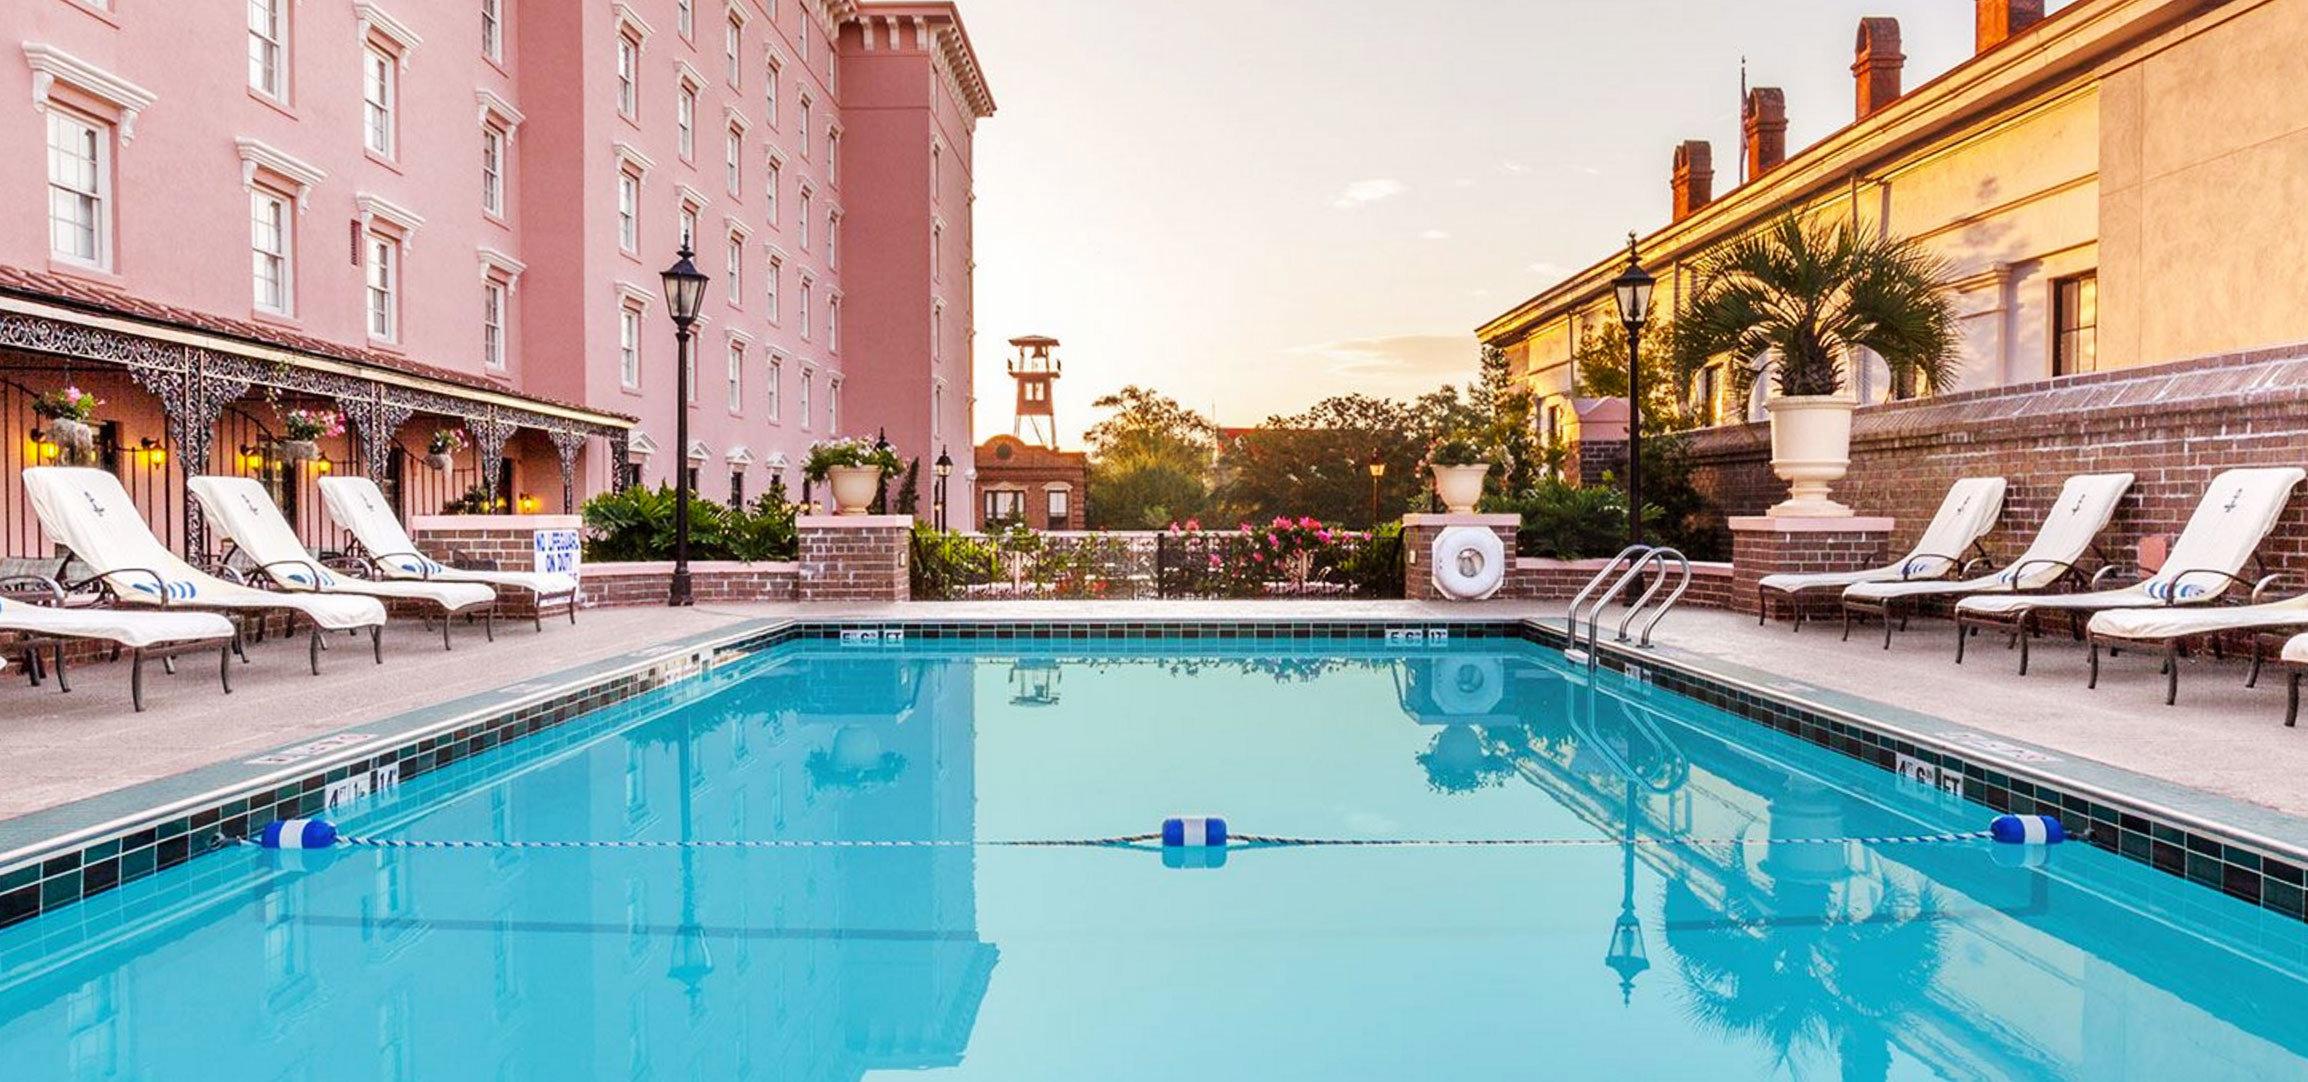 building swimming pool leisure property reflecting pool resort town palace thermae Villa Resort blue swimming